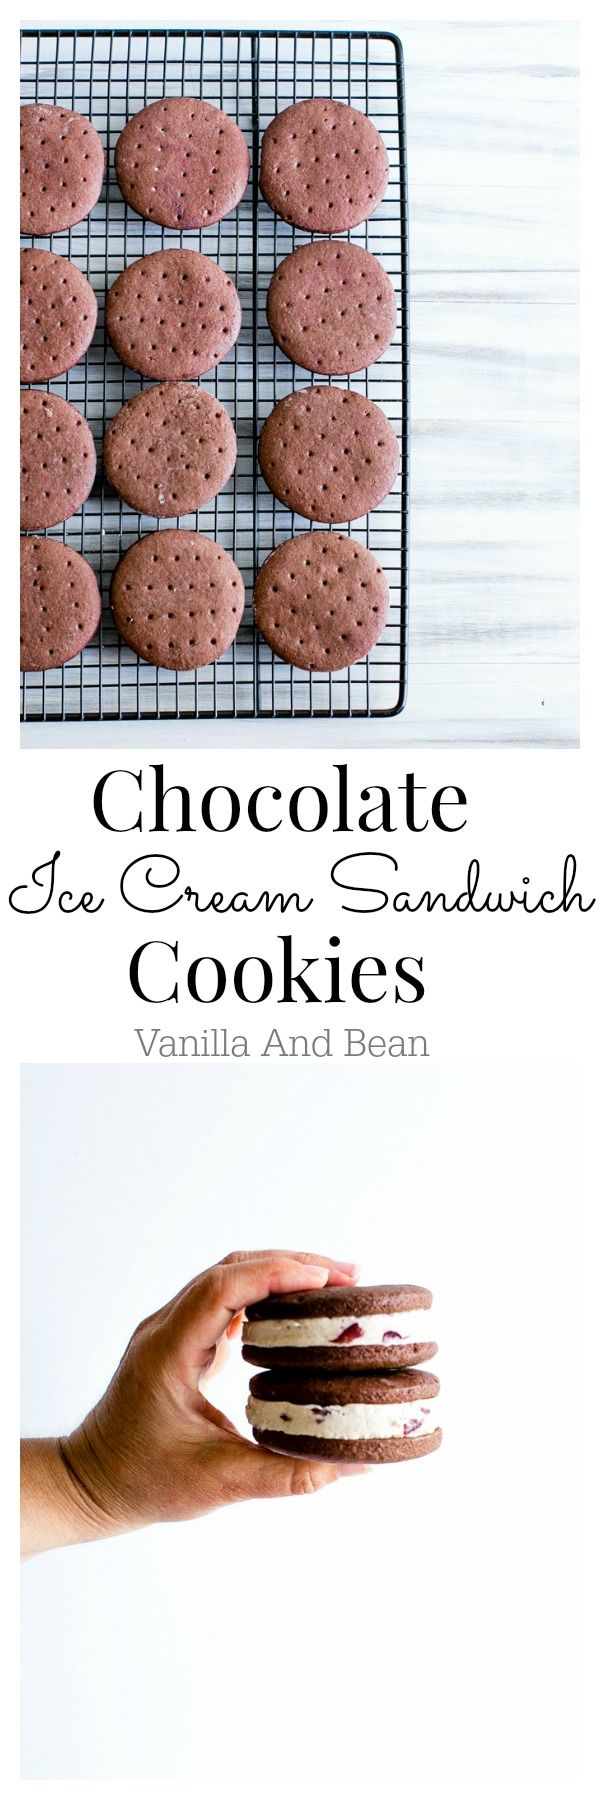 Chocolate Ice Cream Sandwich Cookies #Vegan   Vanilla And Bean